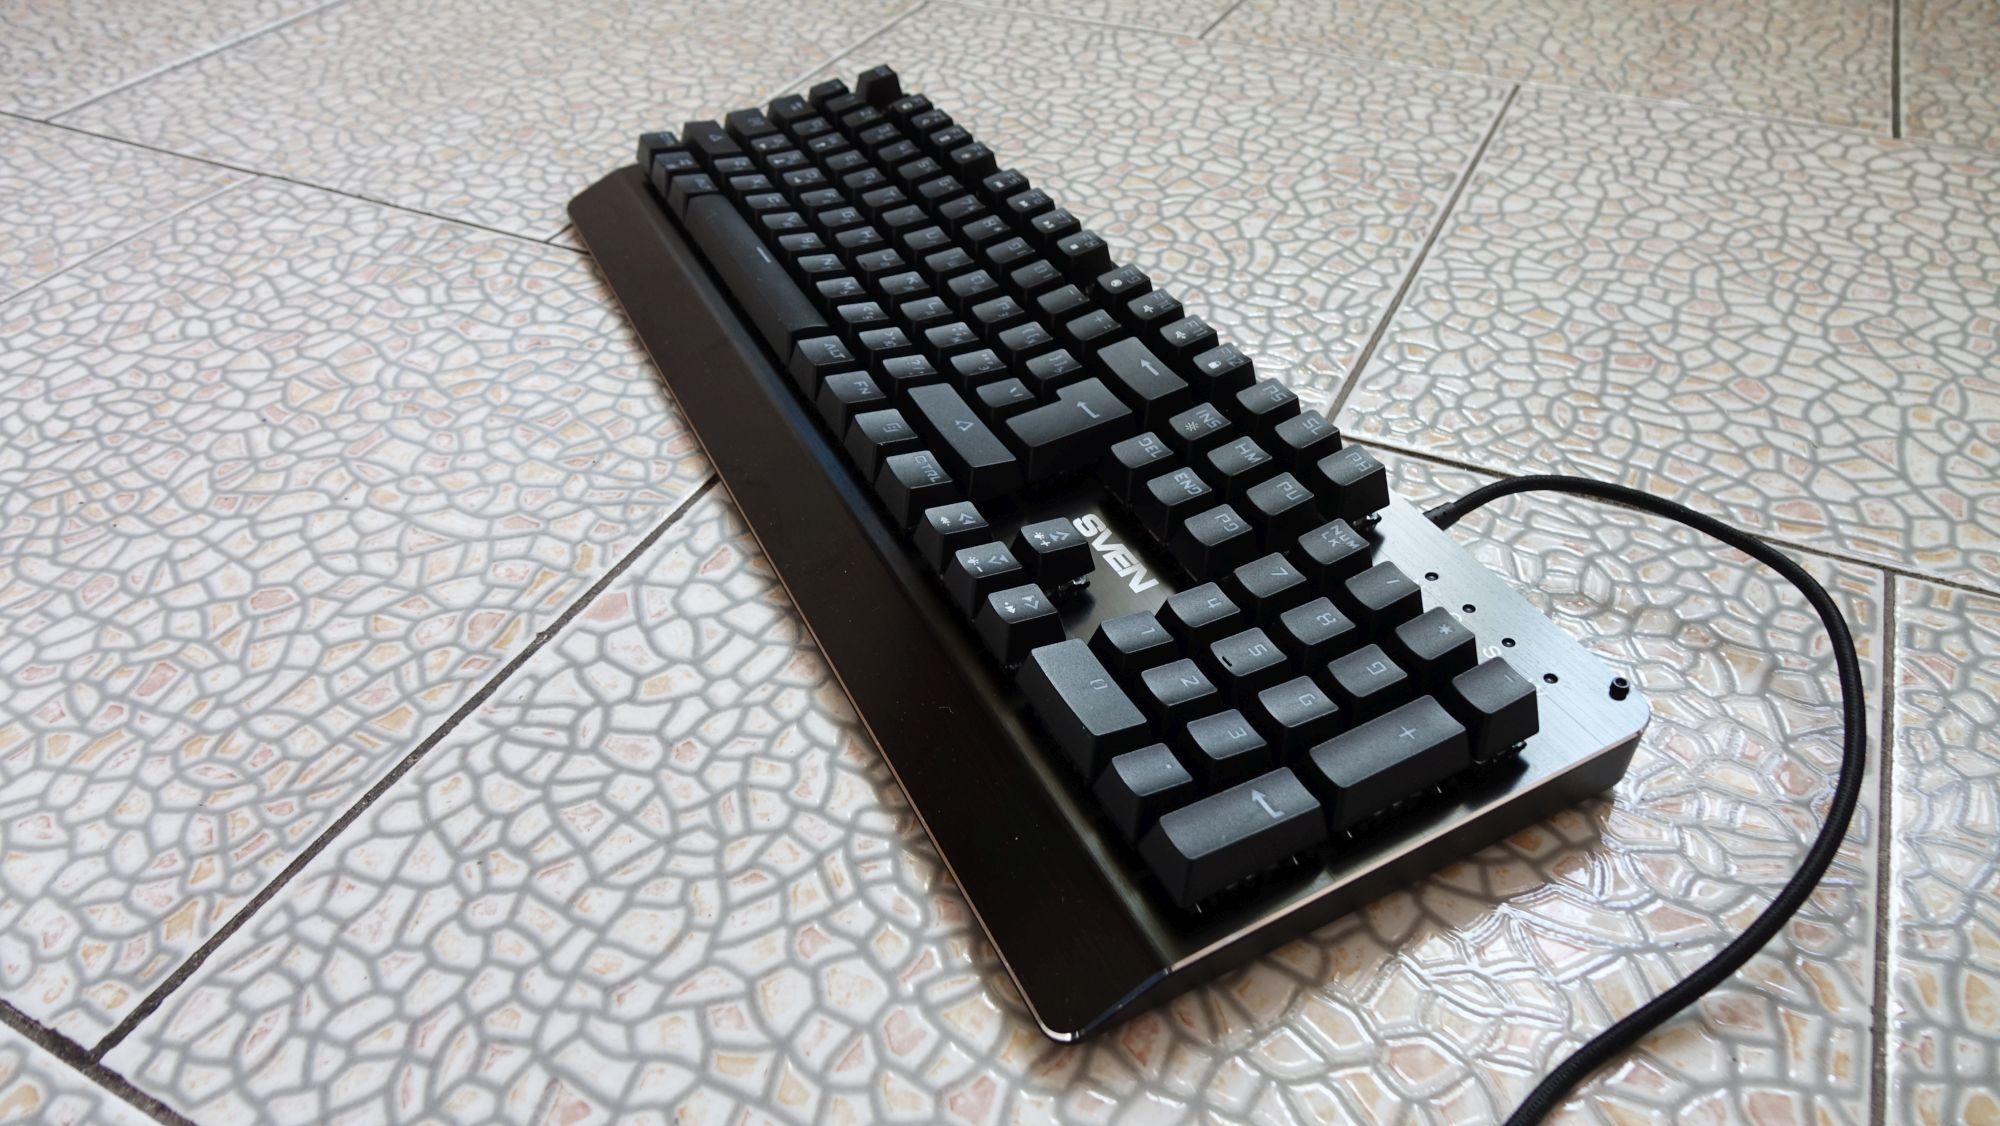 SVEN KB-G9700